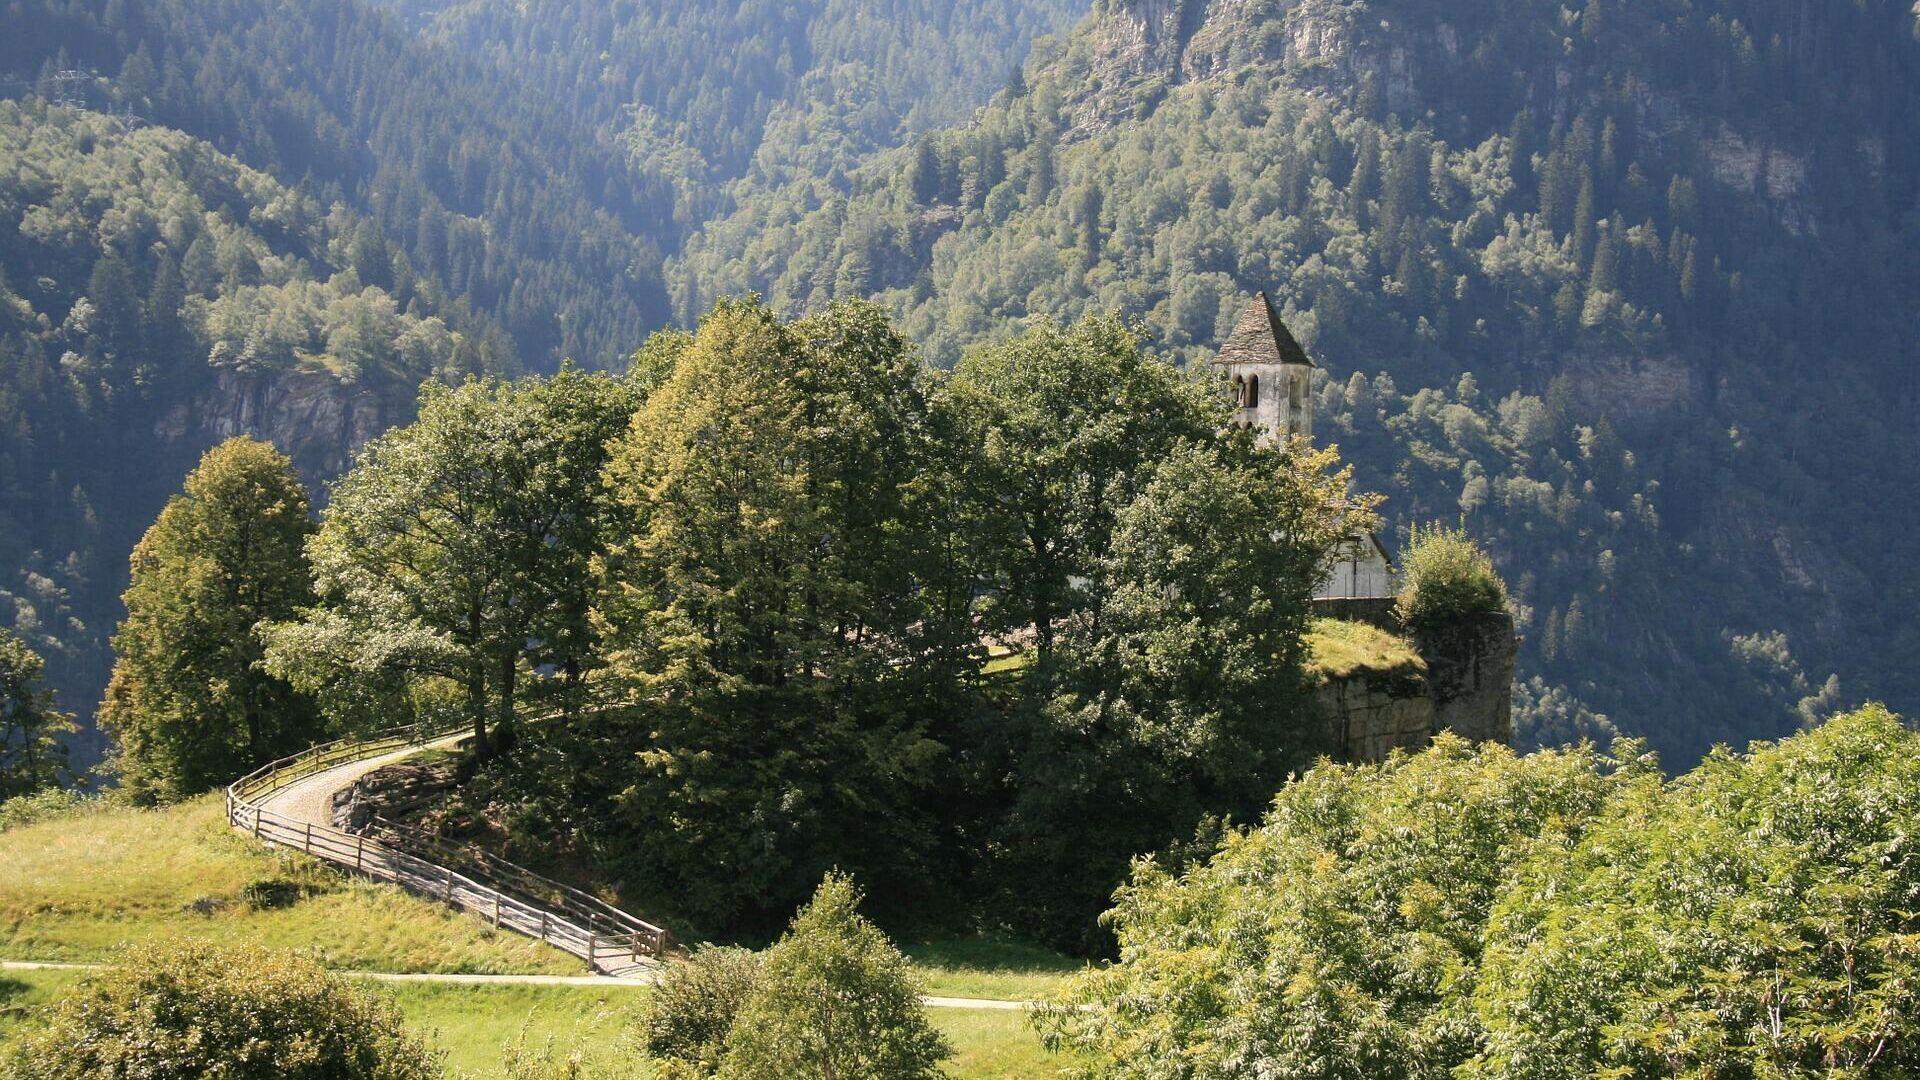 Bosque en Ticino, Suiza (archivo) - Sputnik Mundo, 1920, 29.07.2021